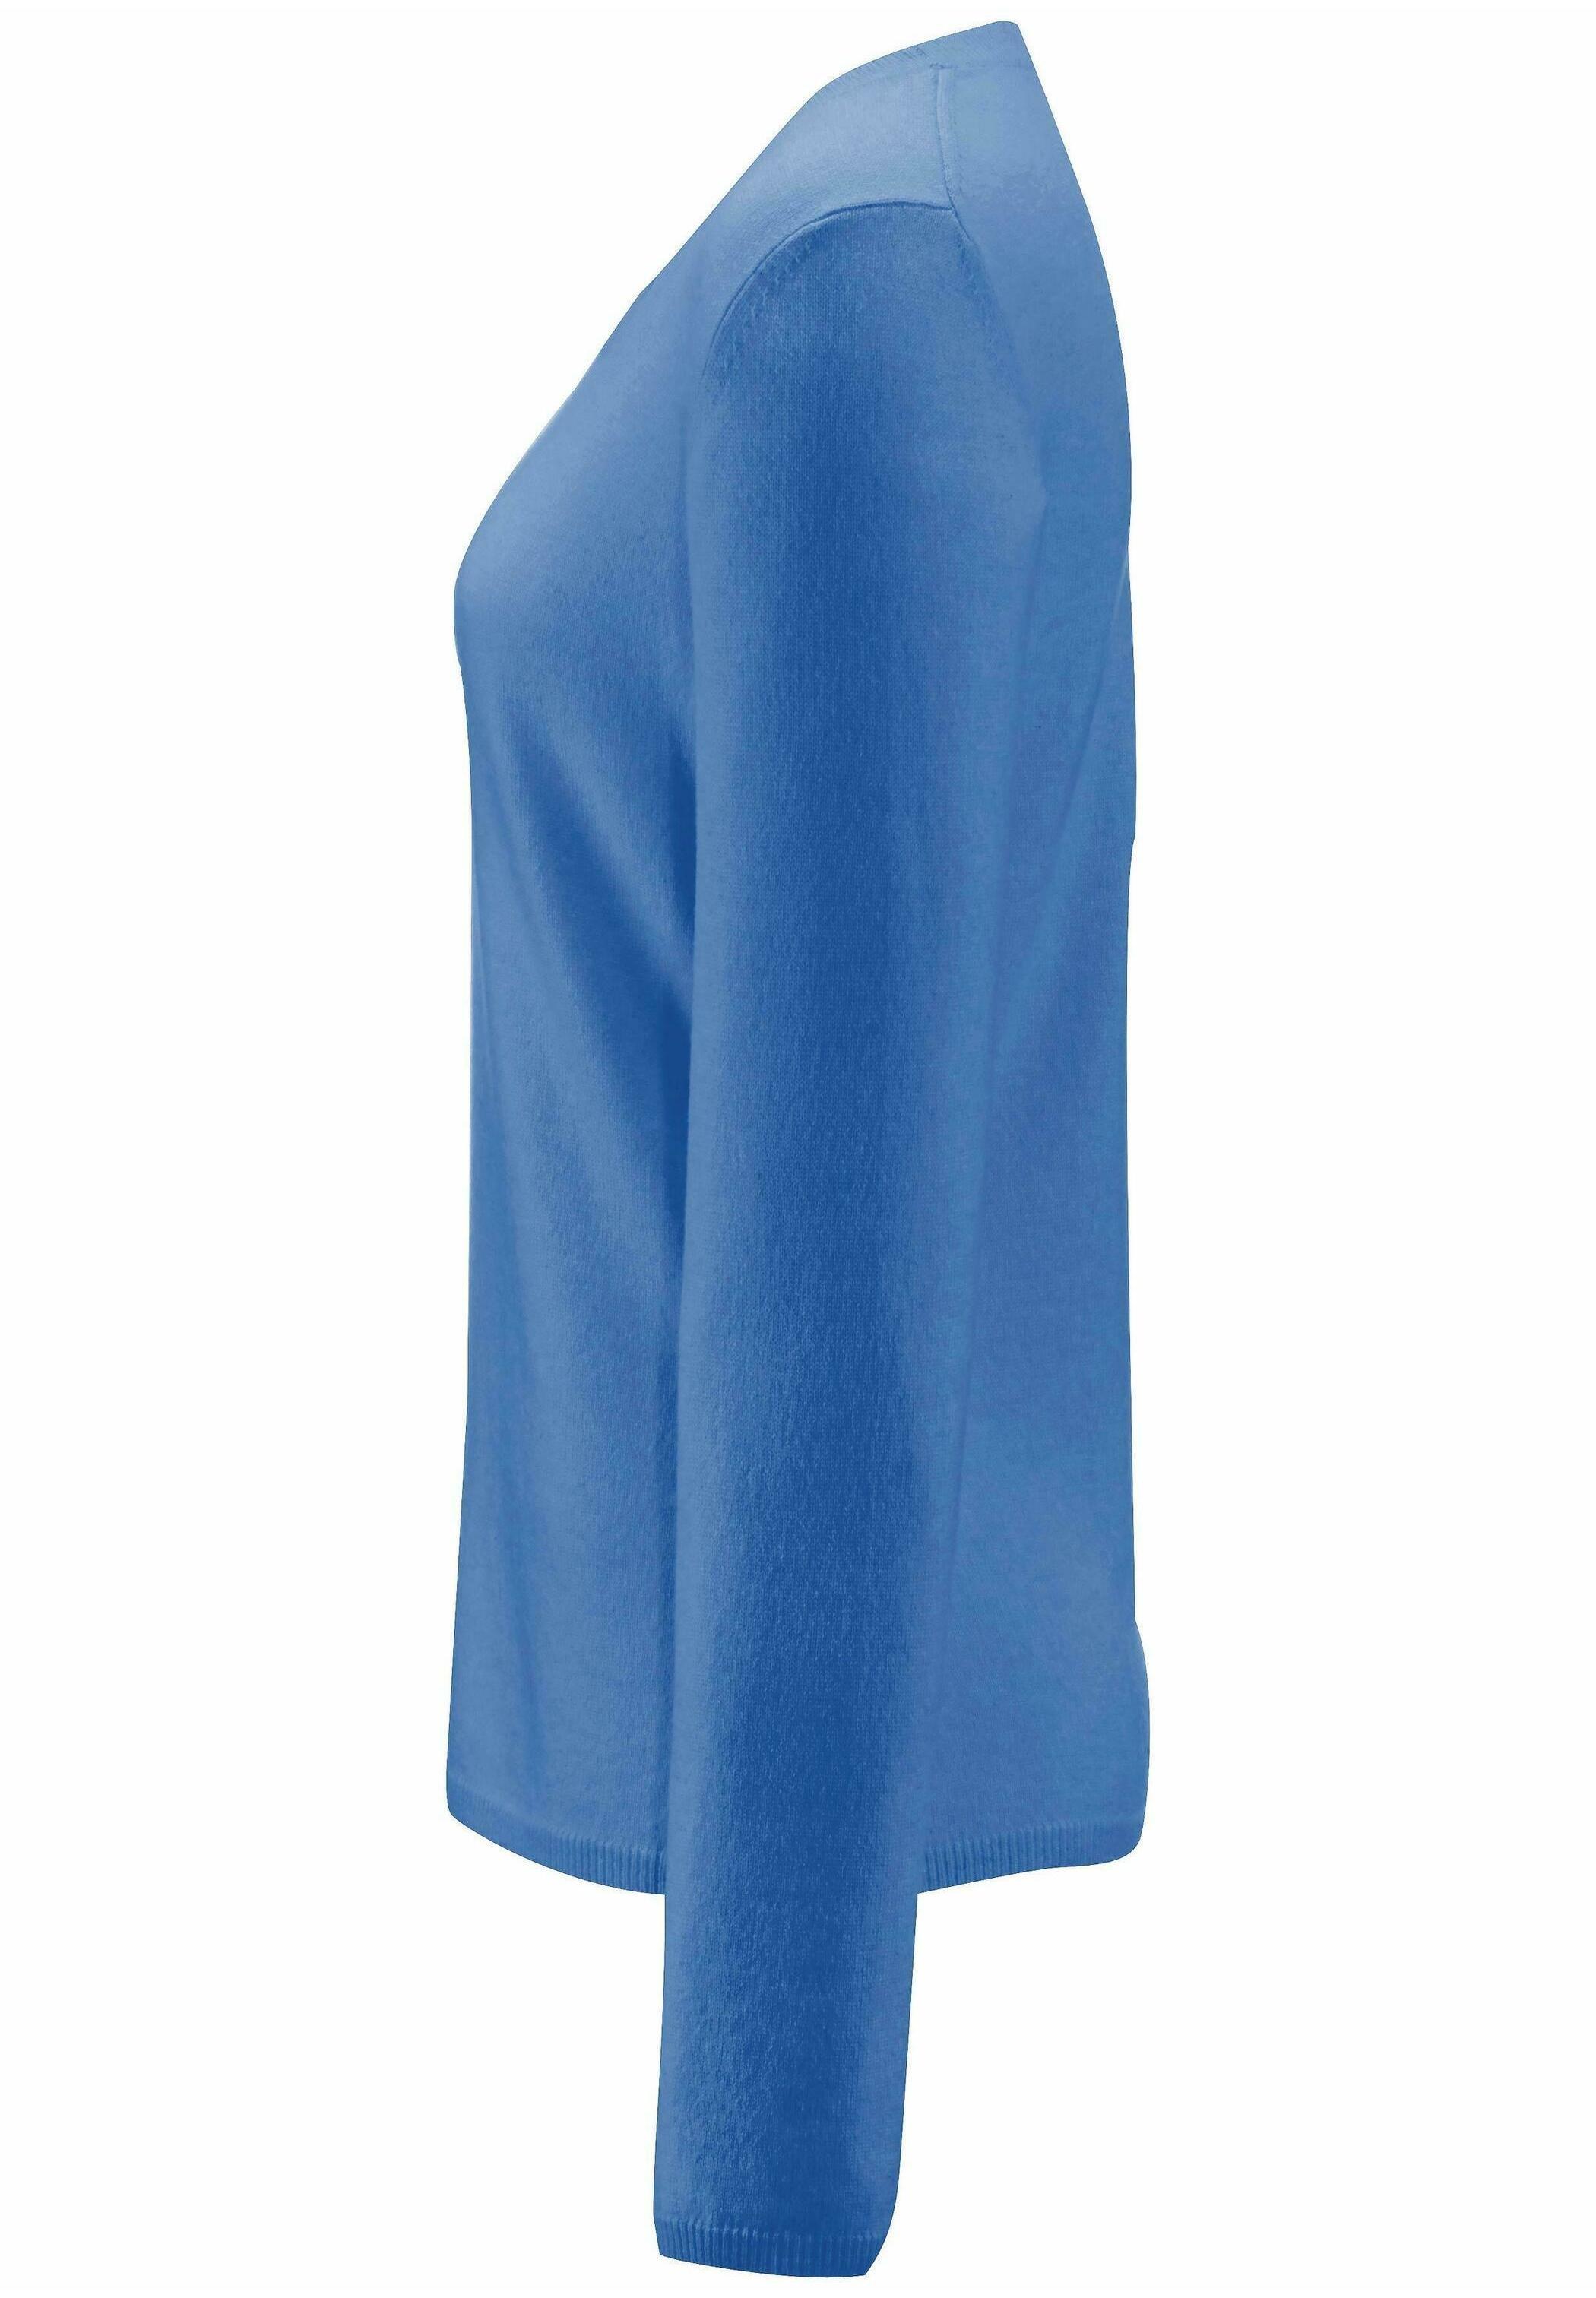 PETER HAHN Pullover - enzianblau - Pulls & Gilets Femme JIKC5